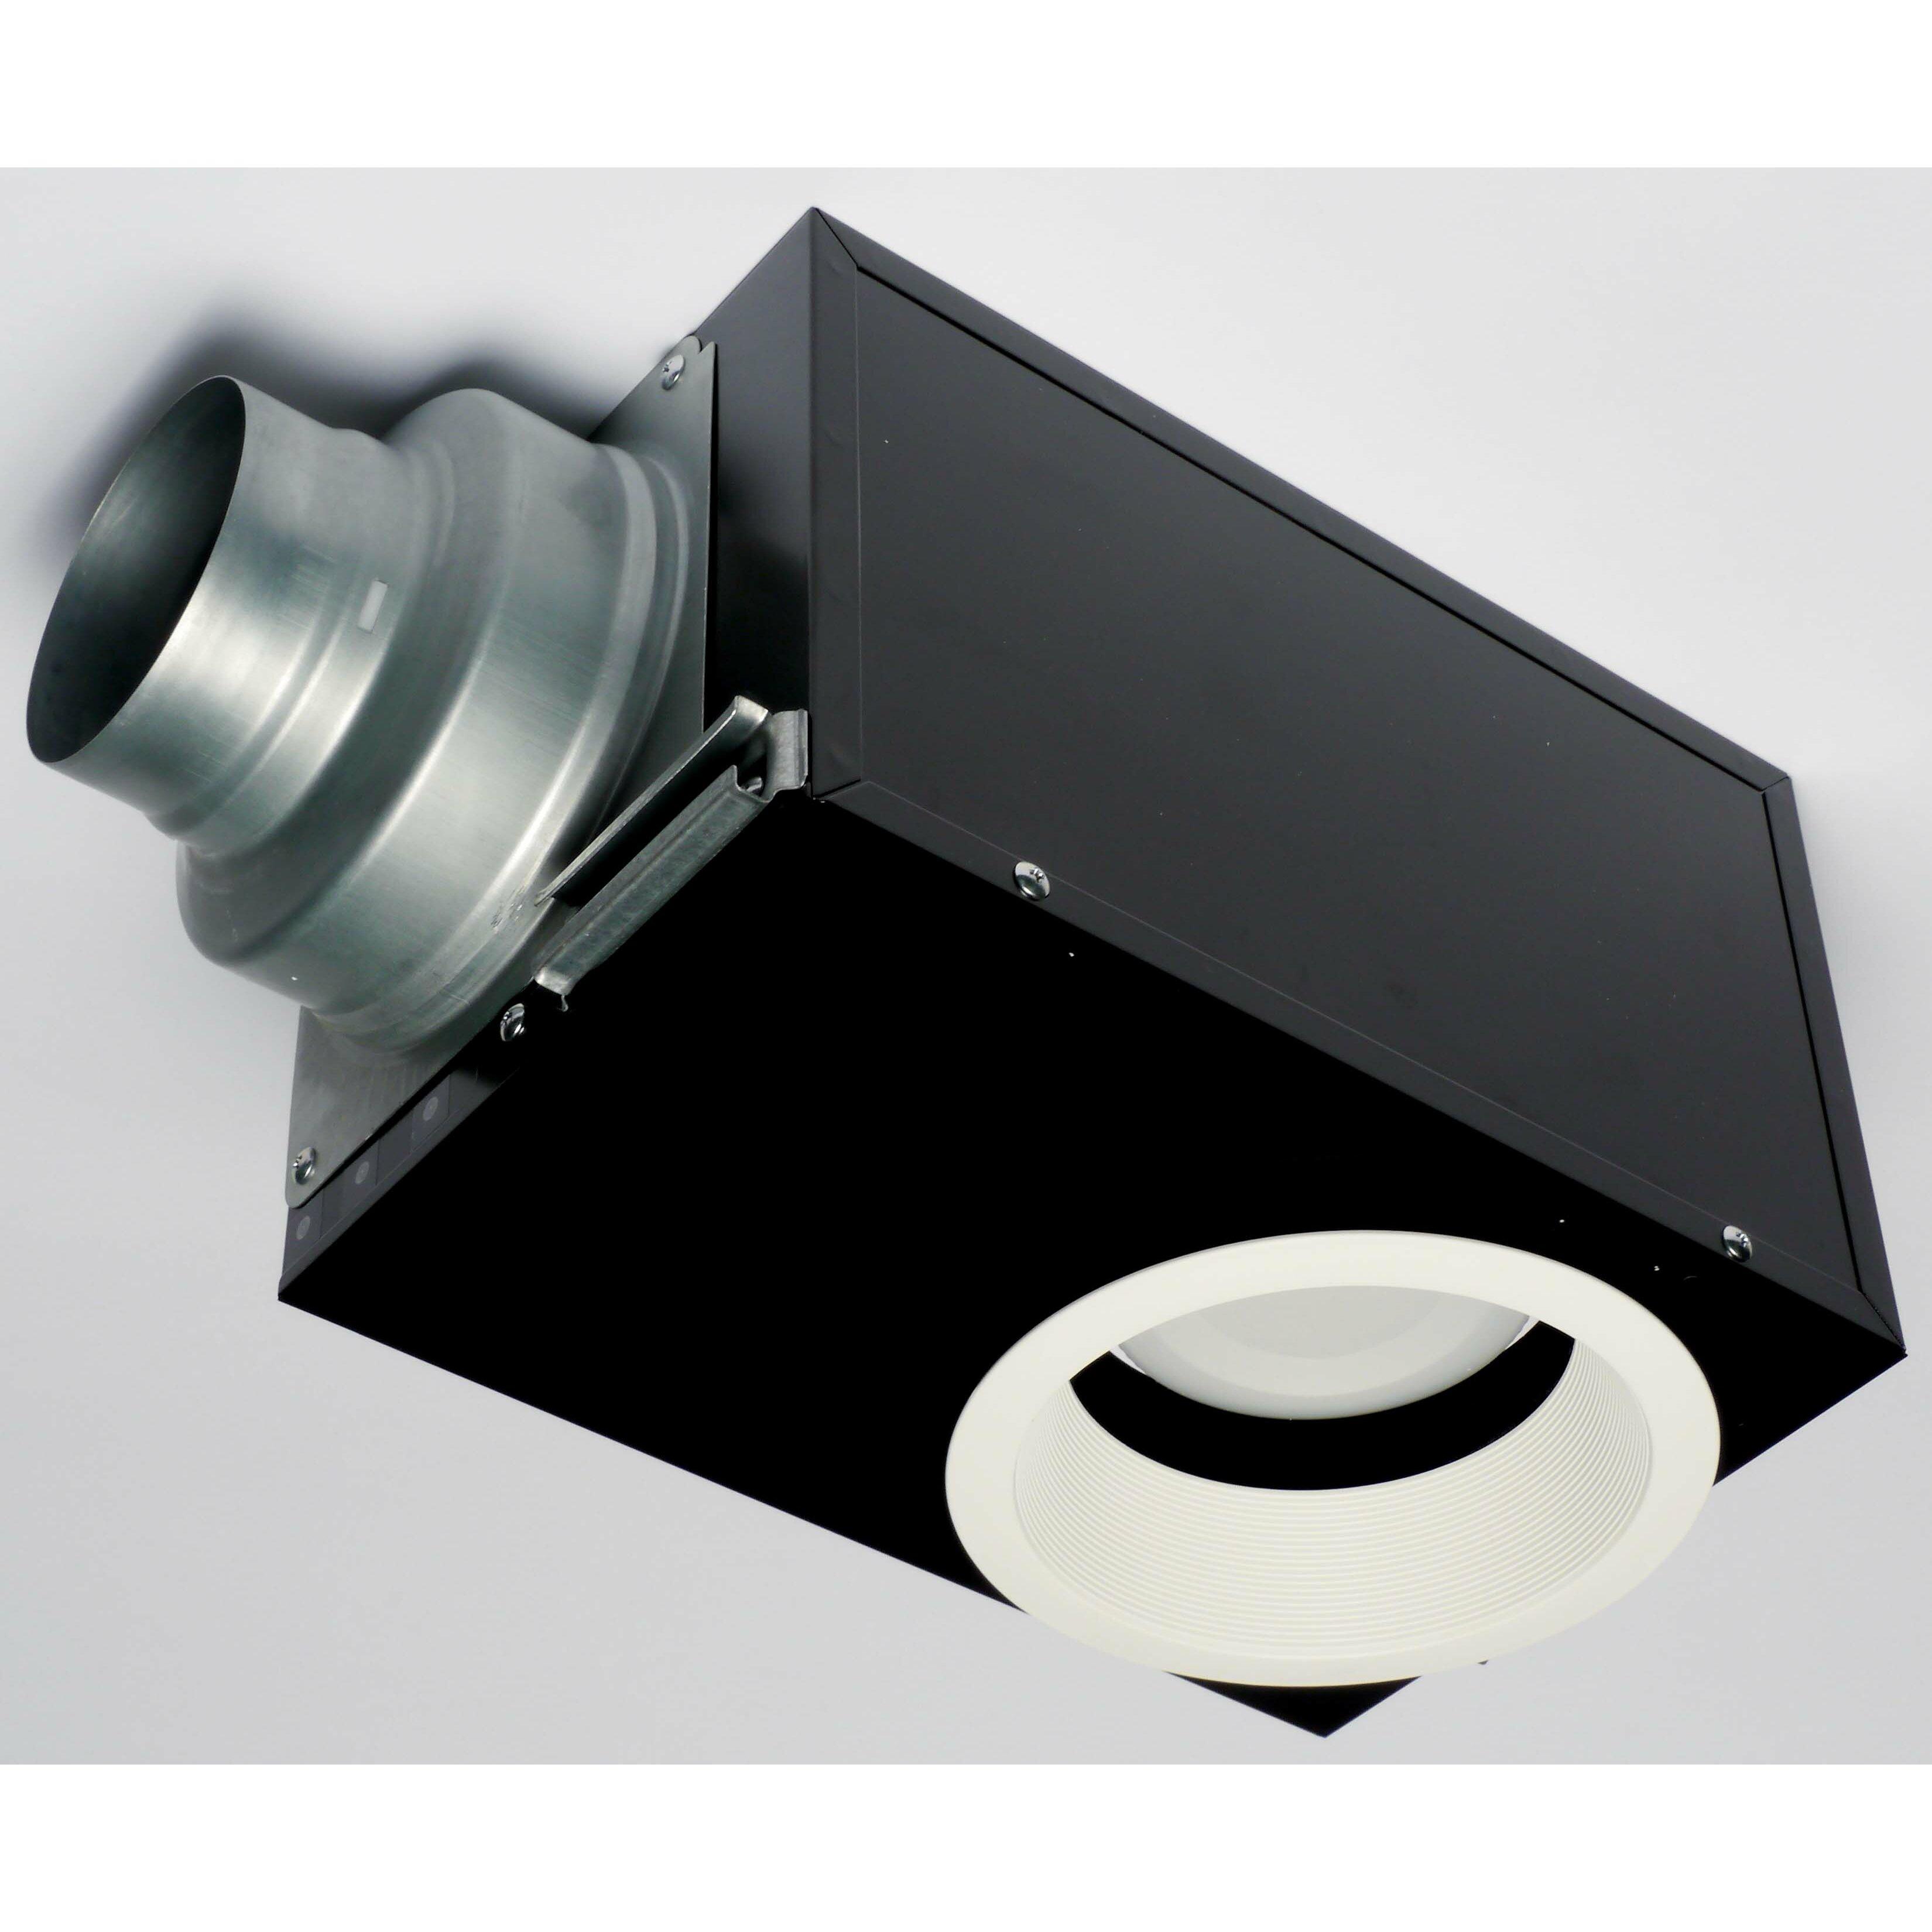 panasonic whisperrecessed 80 cfm energy star bathroom fan. Black Bedroom Furniture Sets. Home Design Ideas